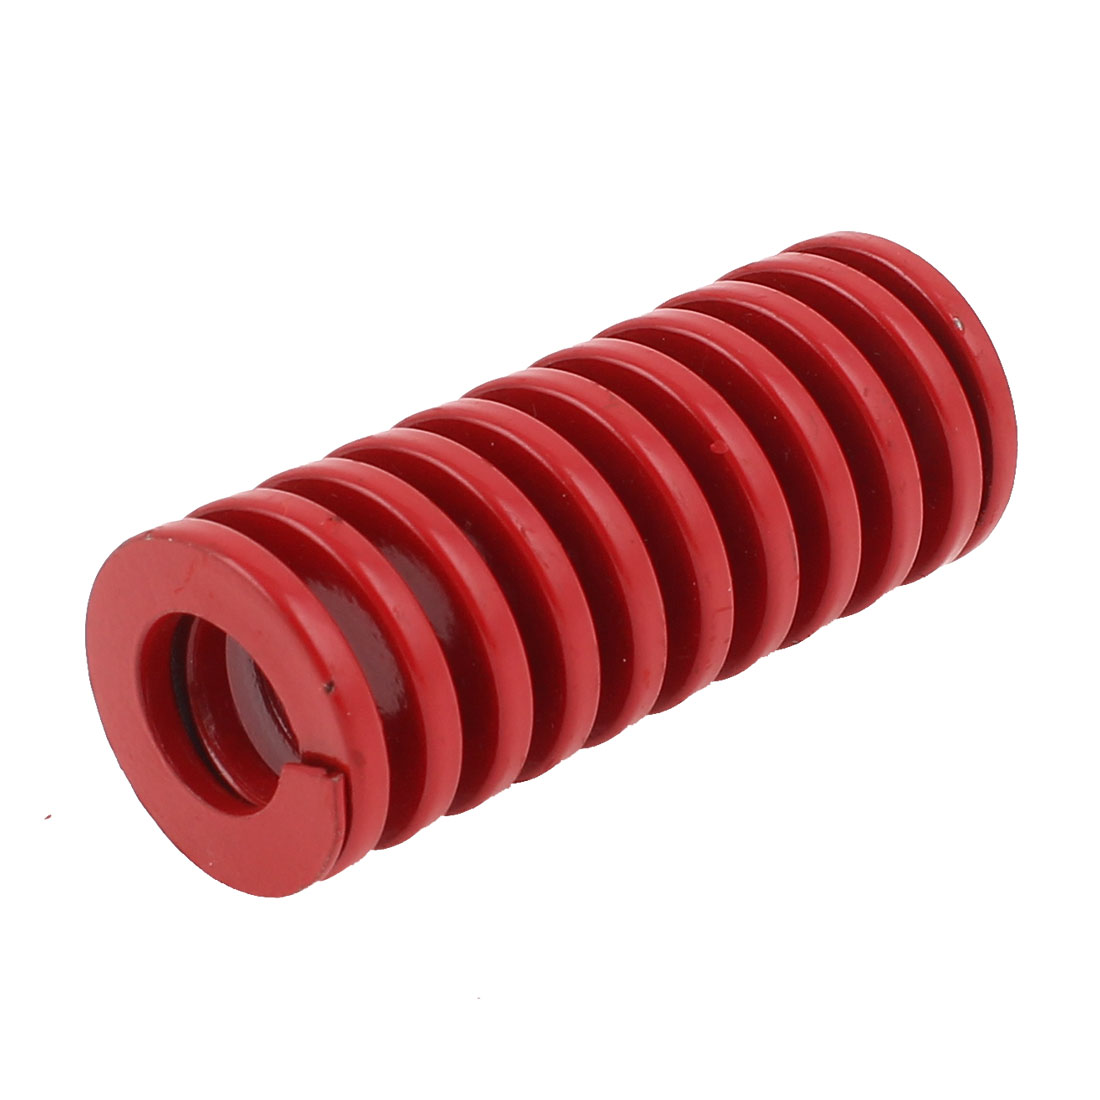 27x13.5x65mm Spiral Chromium Alloy Steel Stamping Compression Die Spring